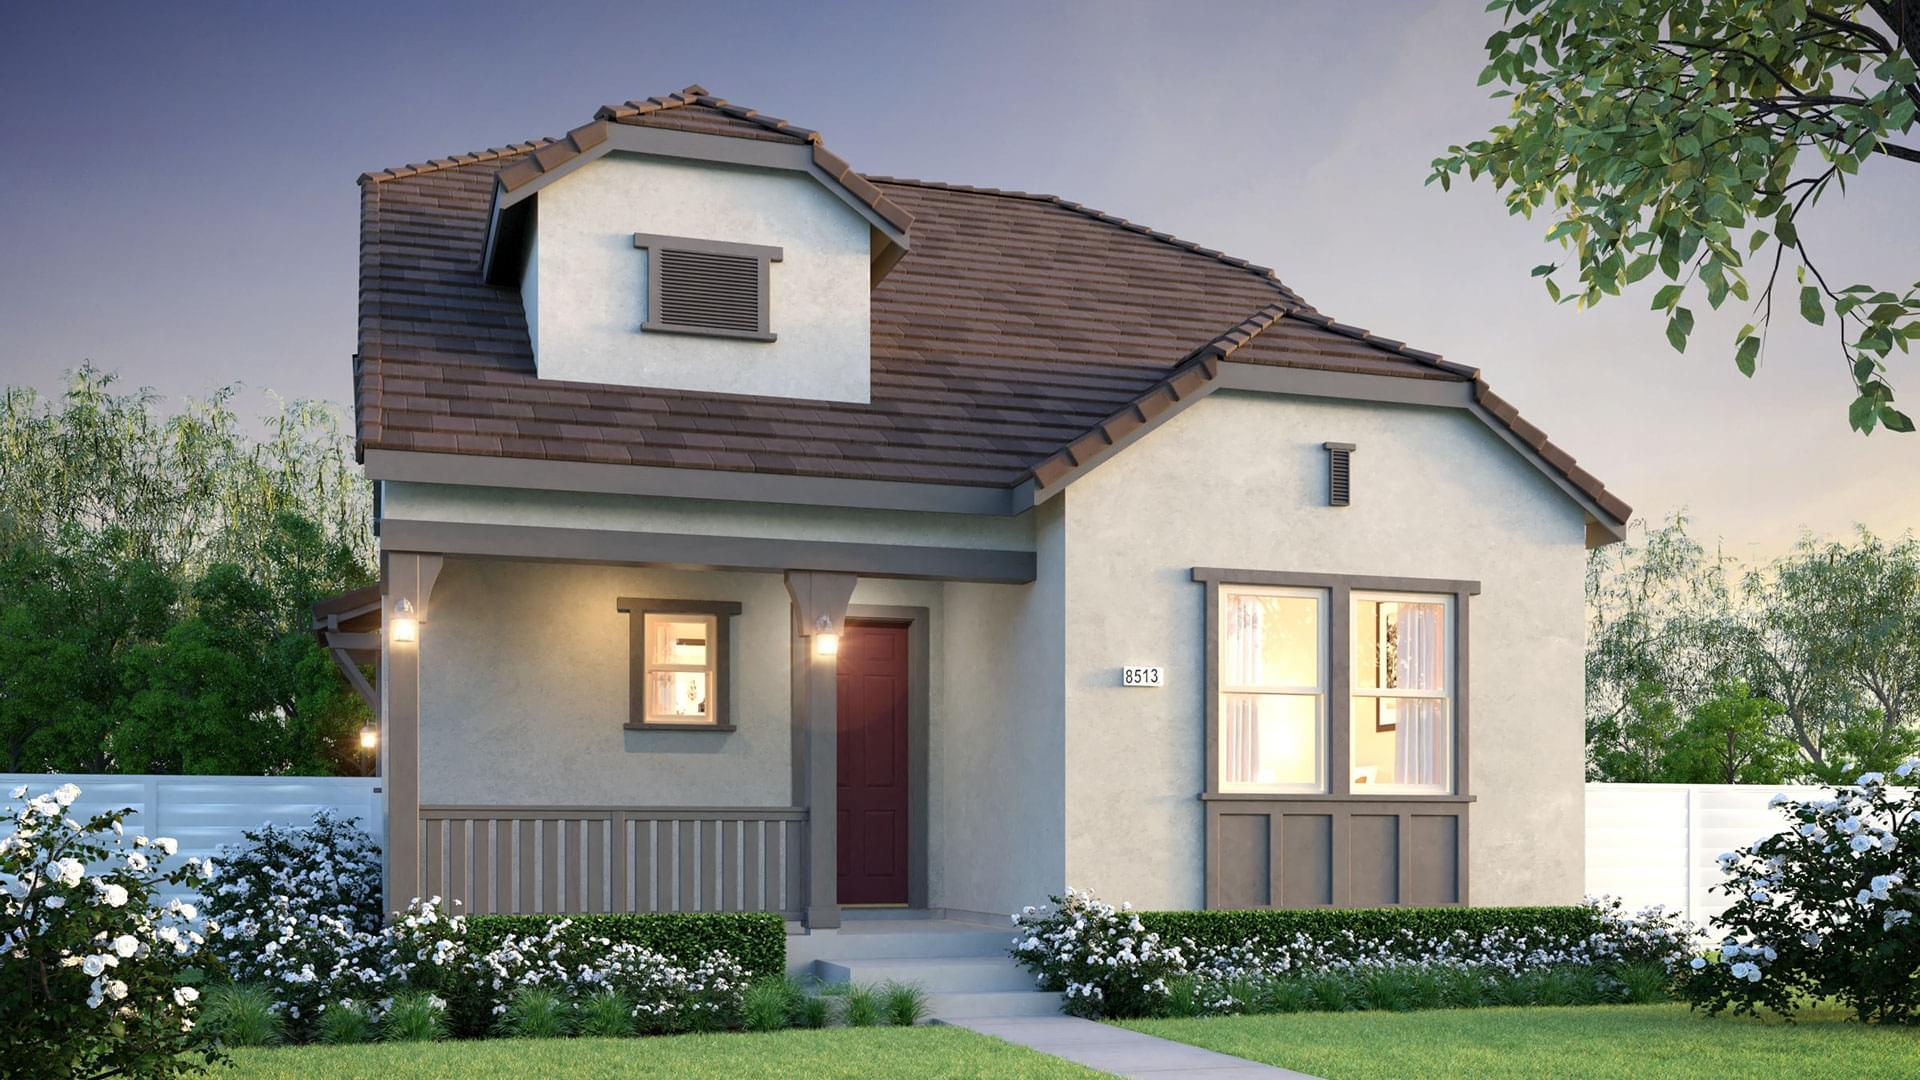 850 Hayes Street in , CA by DeNova Homes